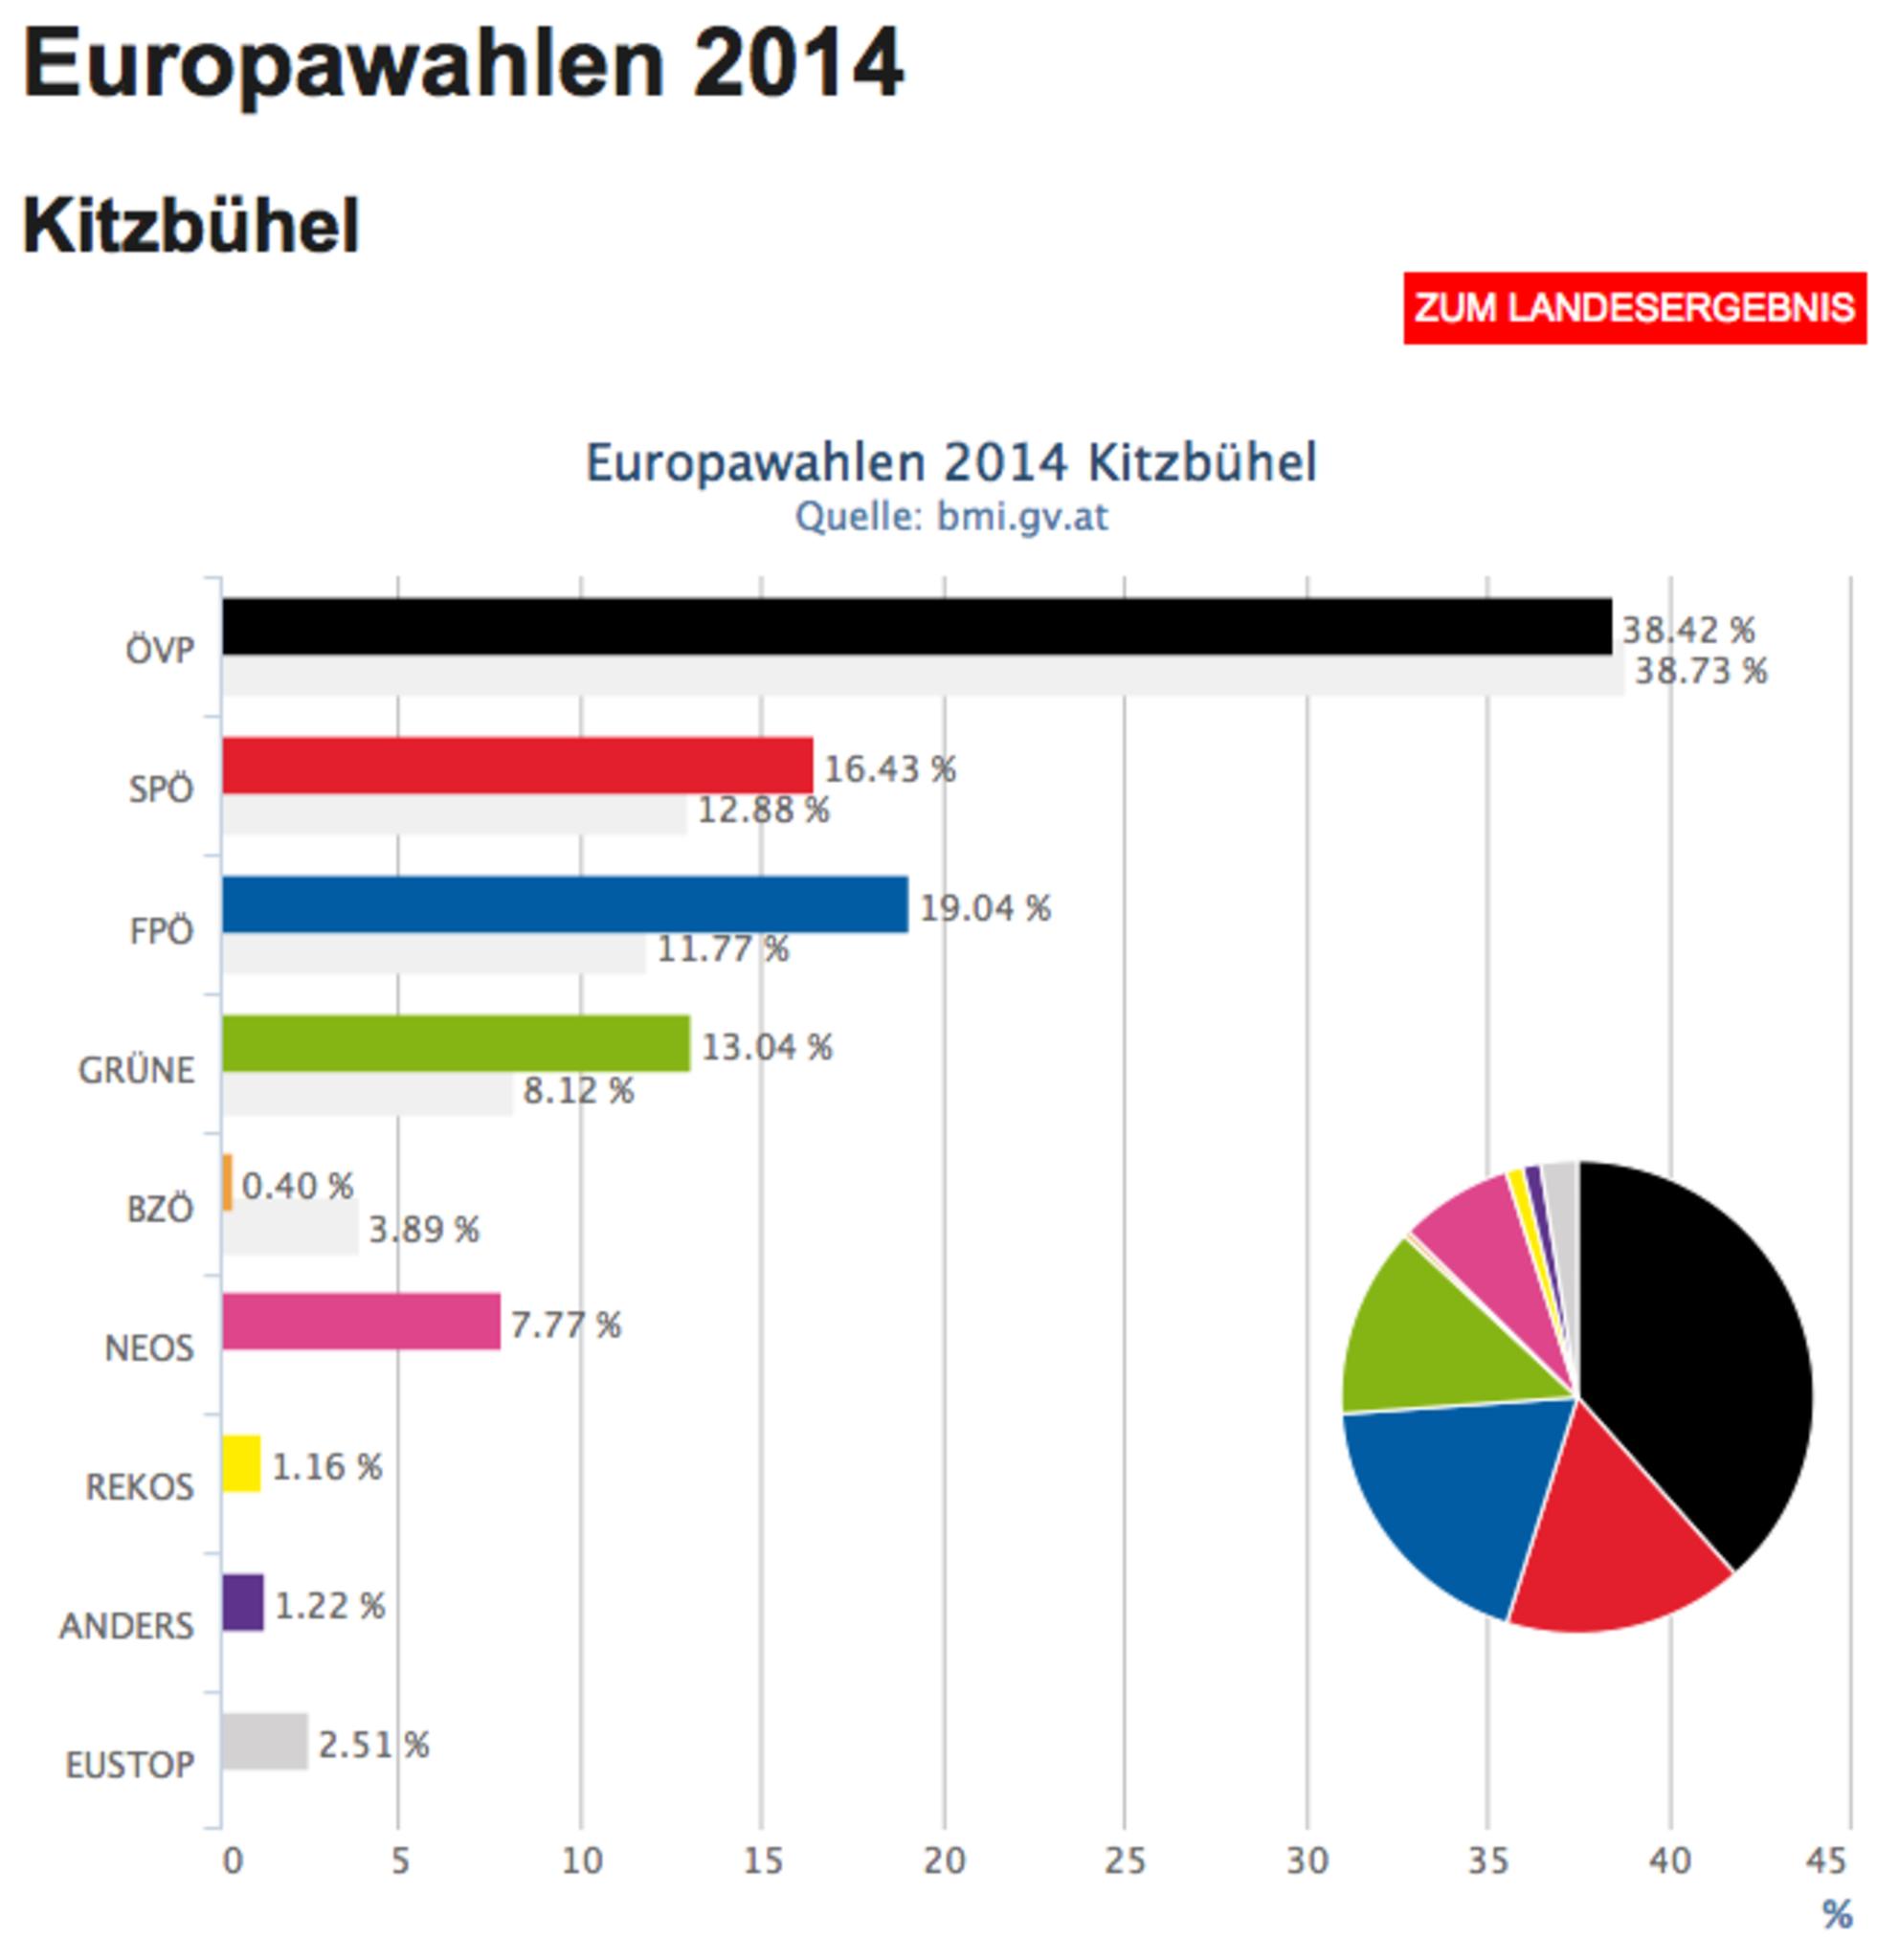 Ergebnis KitzbГјhel